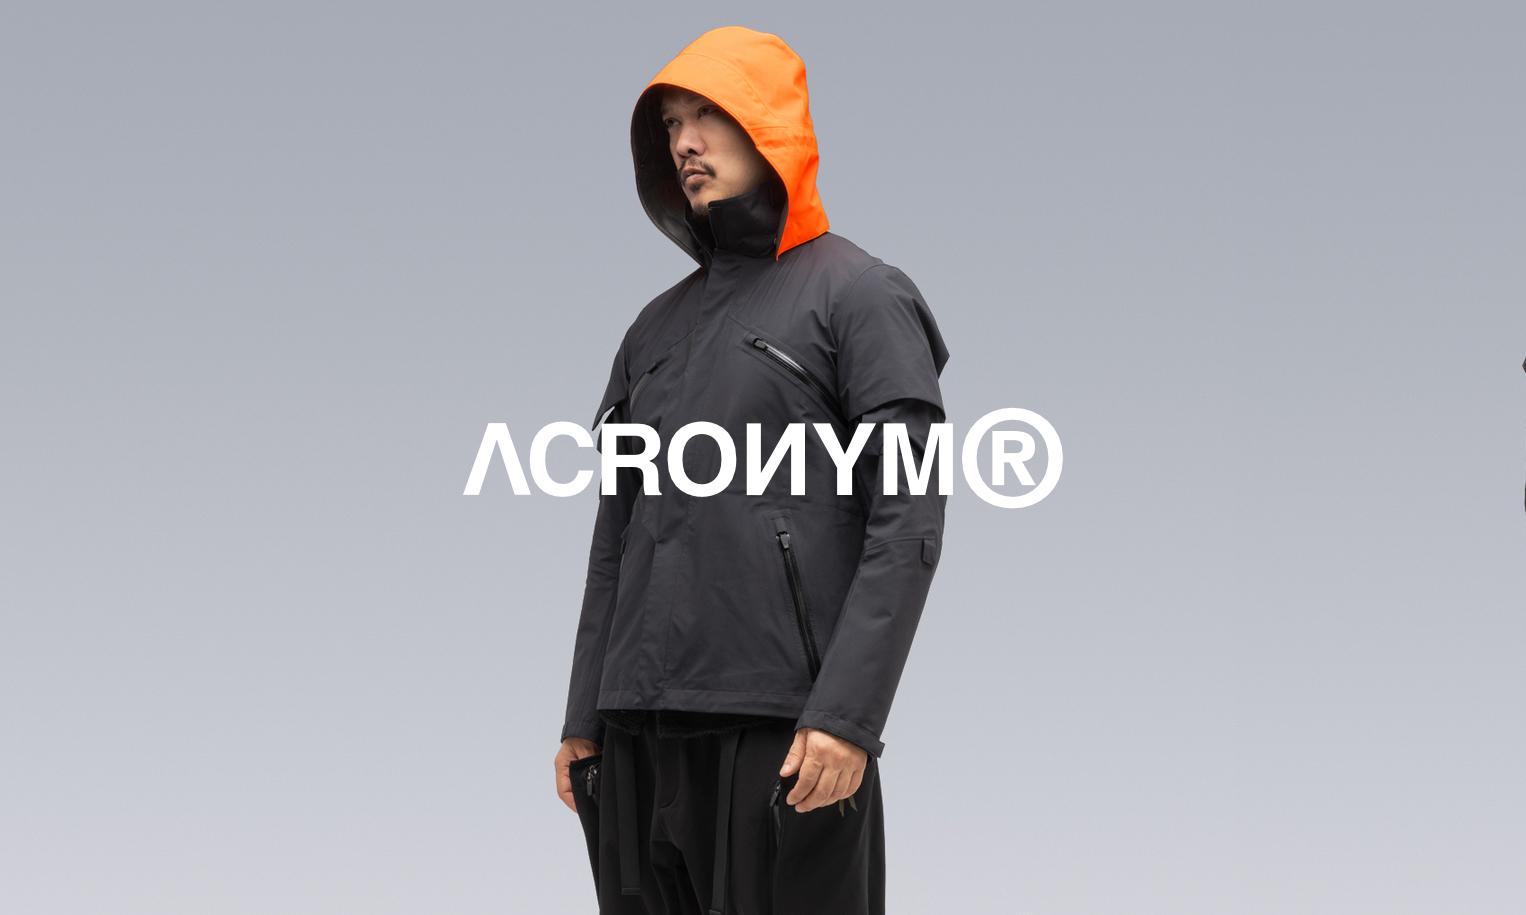 ACRONYM® 释出 2020 秋冬第四波单品